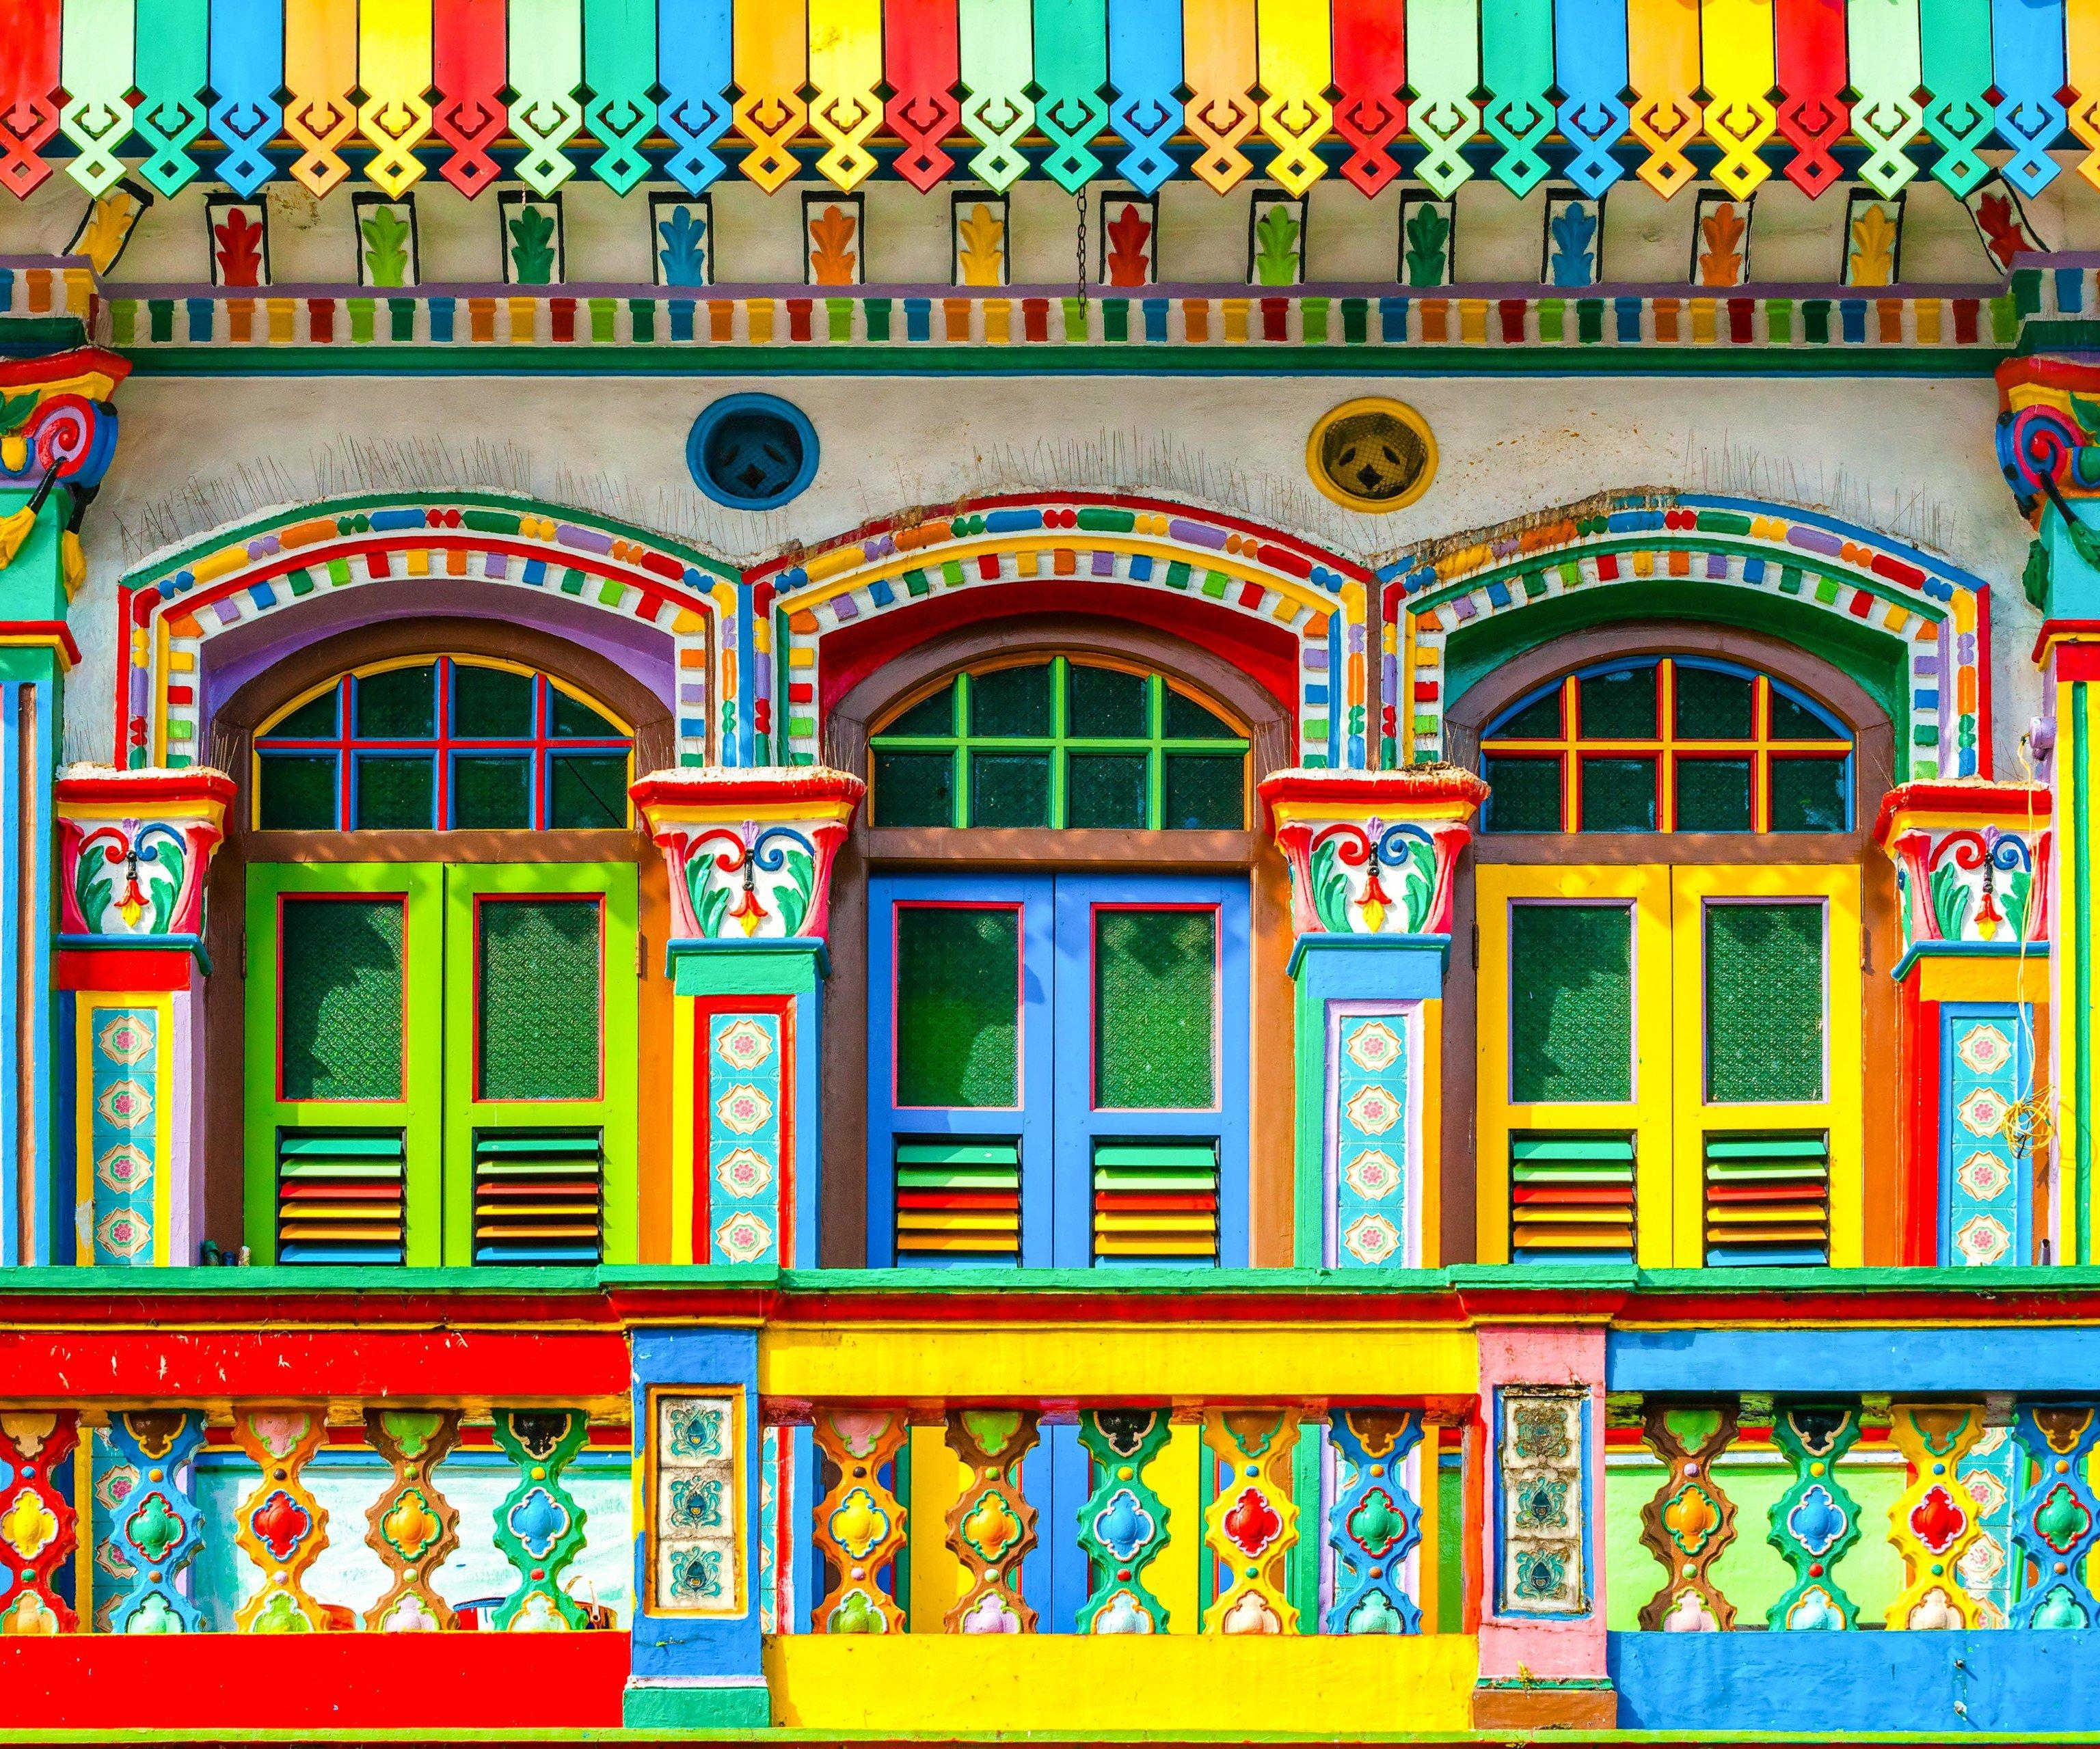 Offbeat Singapore Trip Ideas landmark window facade pattern arch synagogue